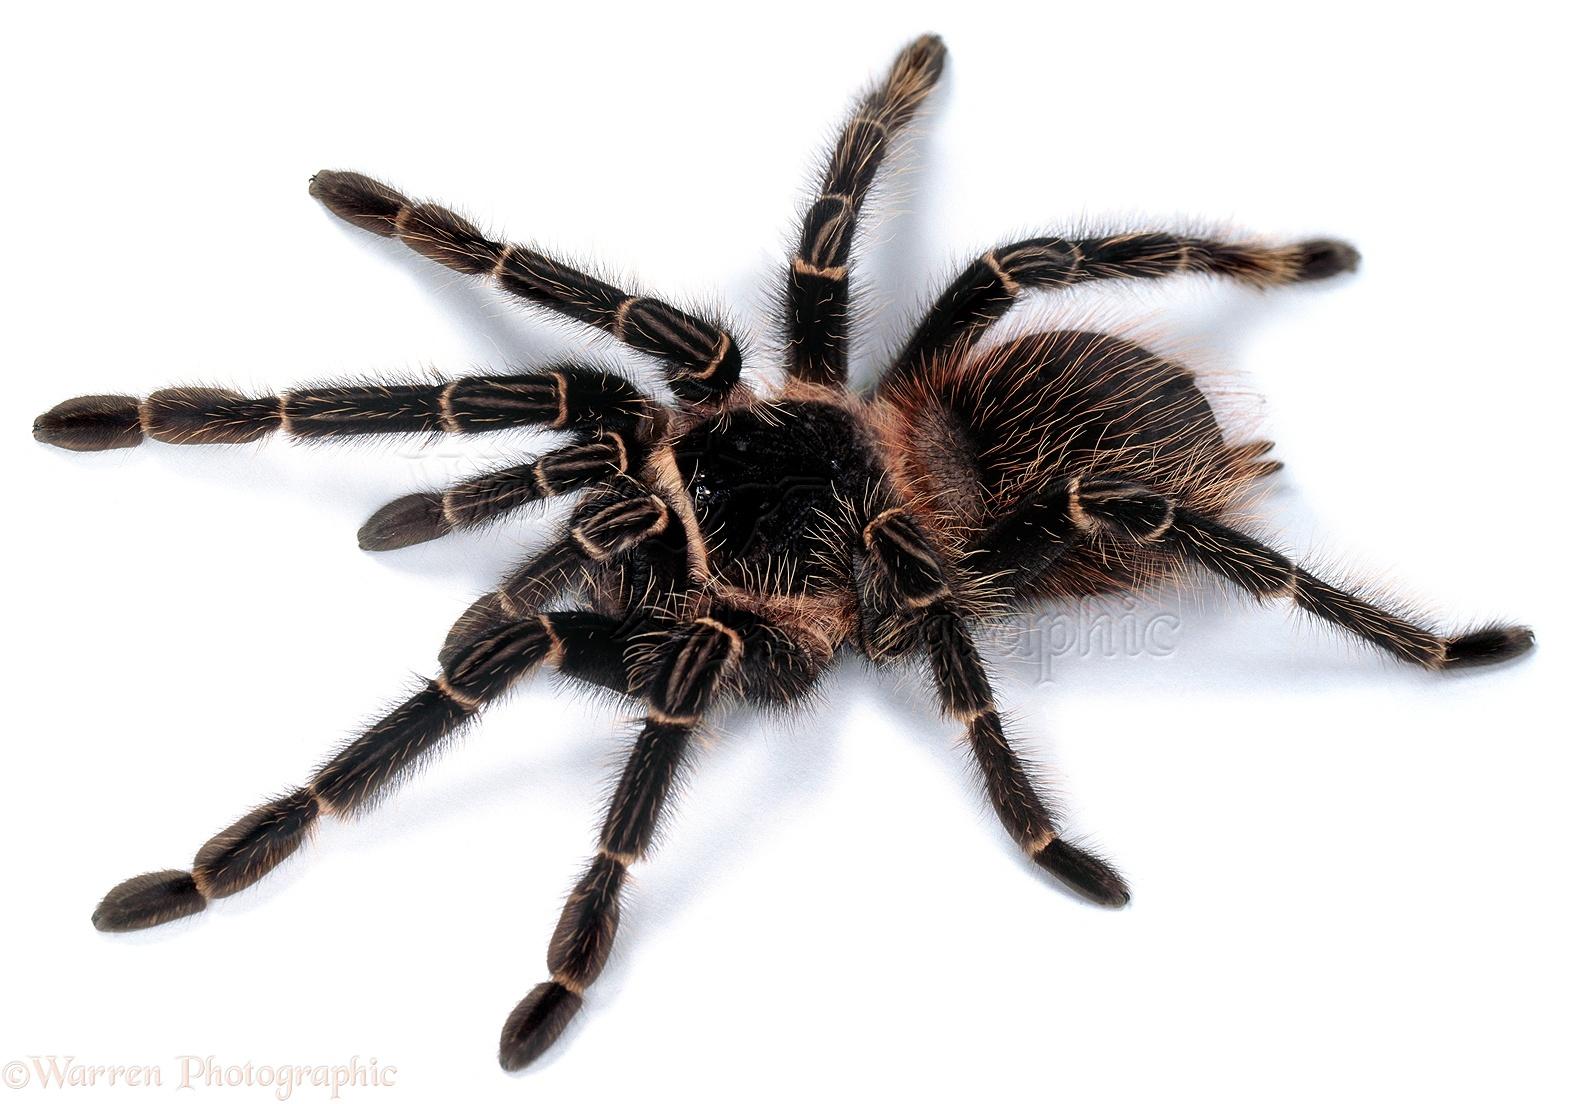 Giant spider eating bird - photo#18